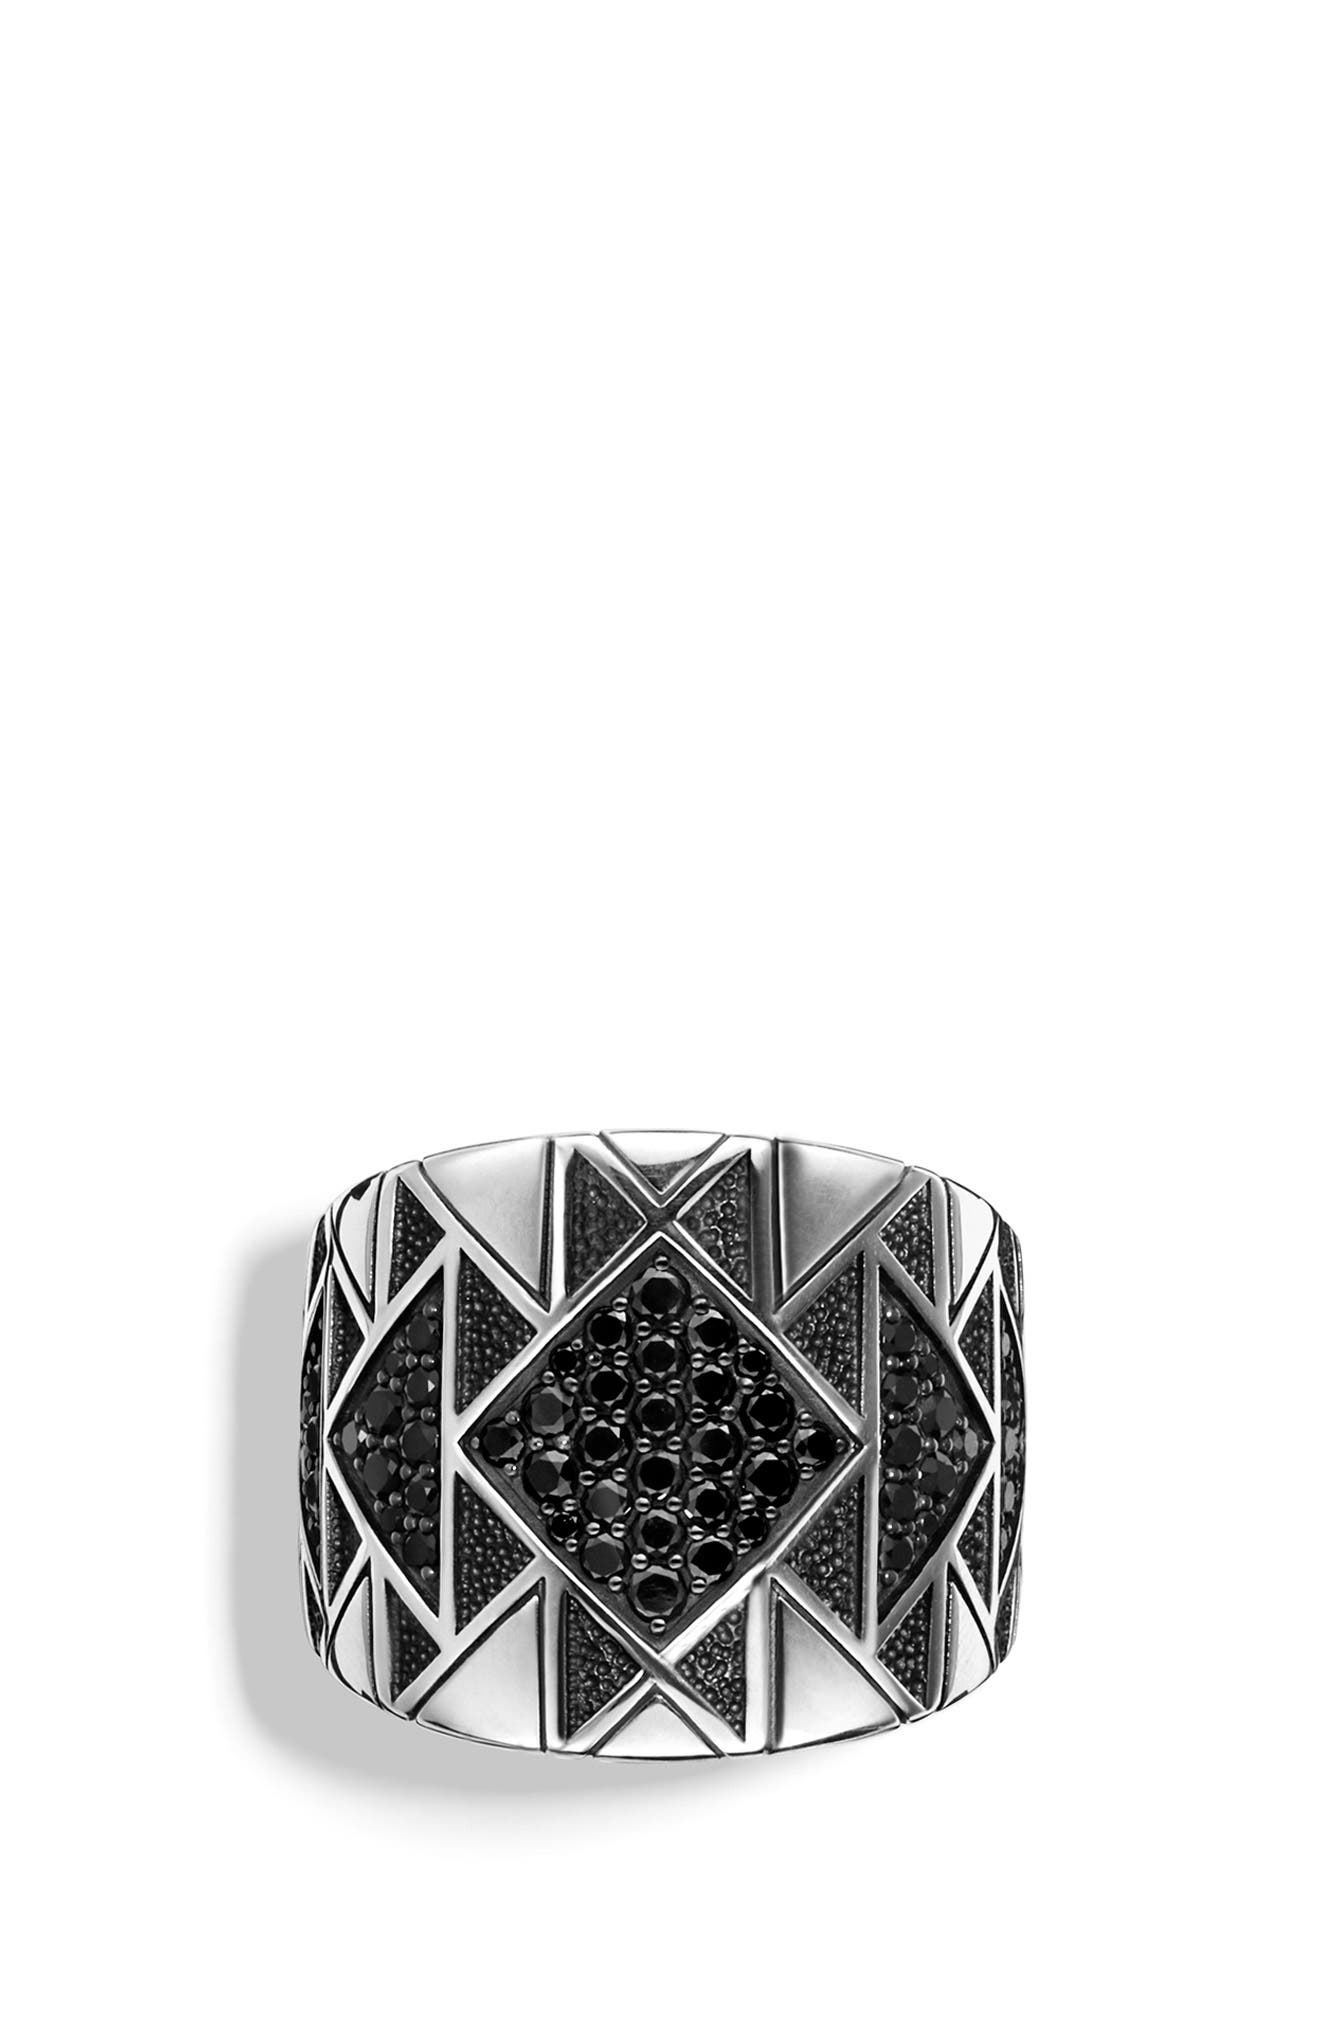 Southwest Signet Ring with Black Diamonds,                             Alternate thumbnail 8, color,